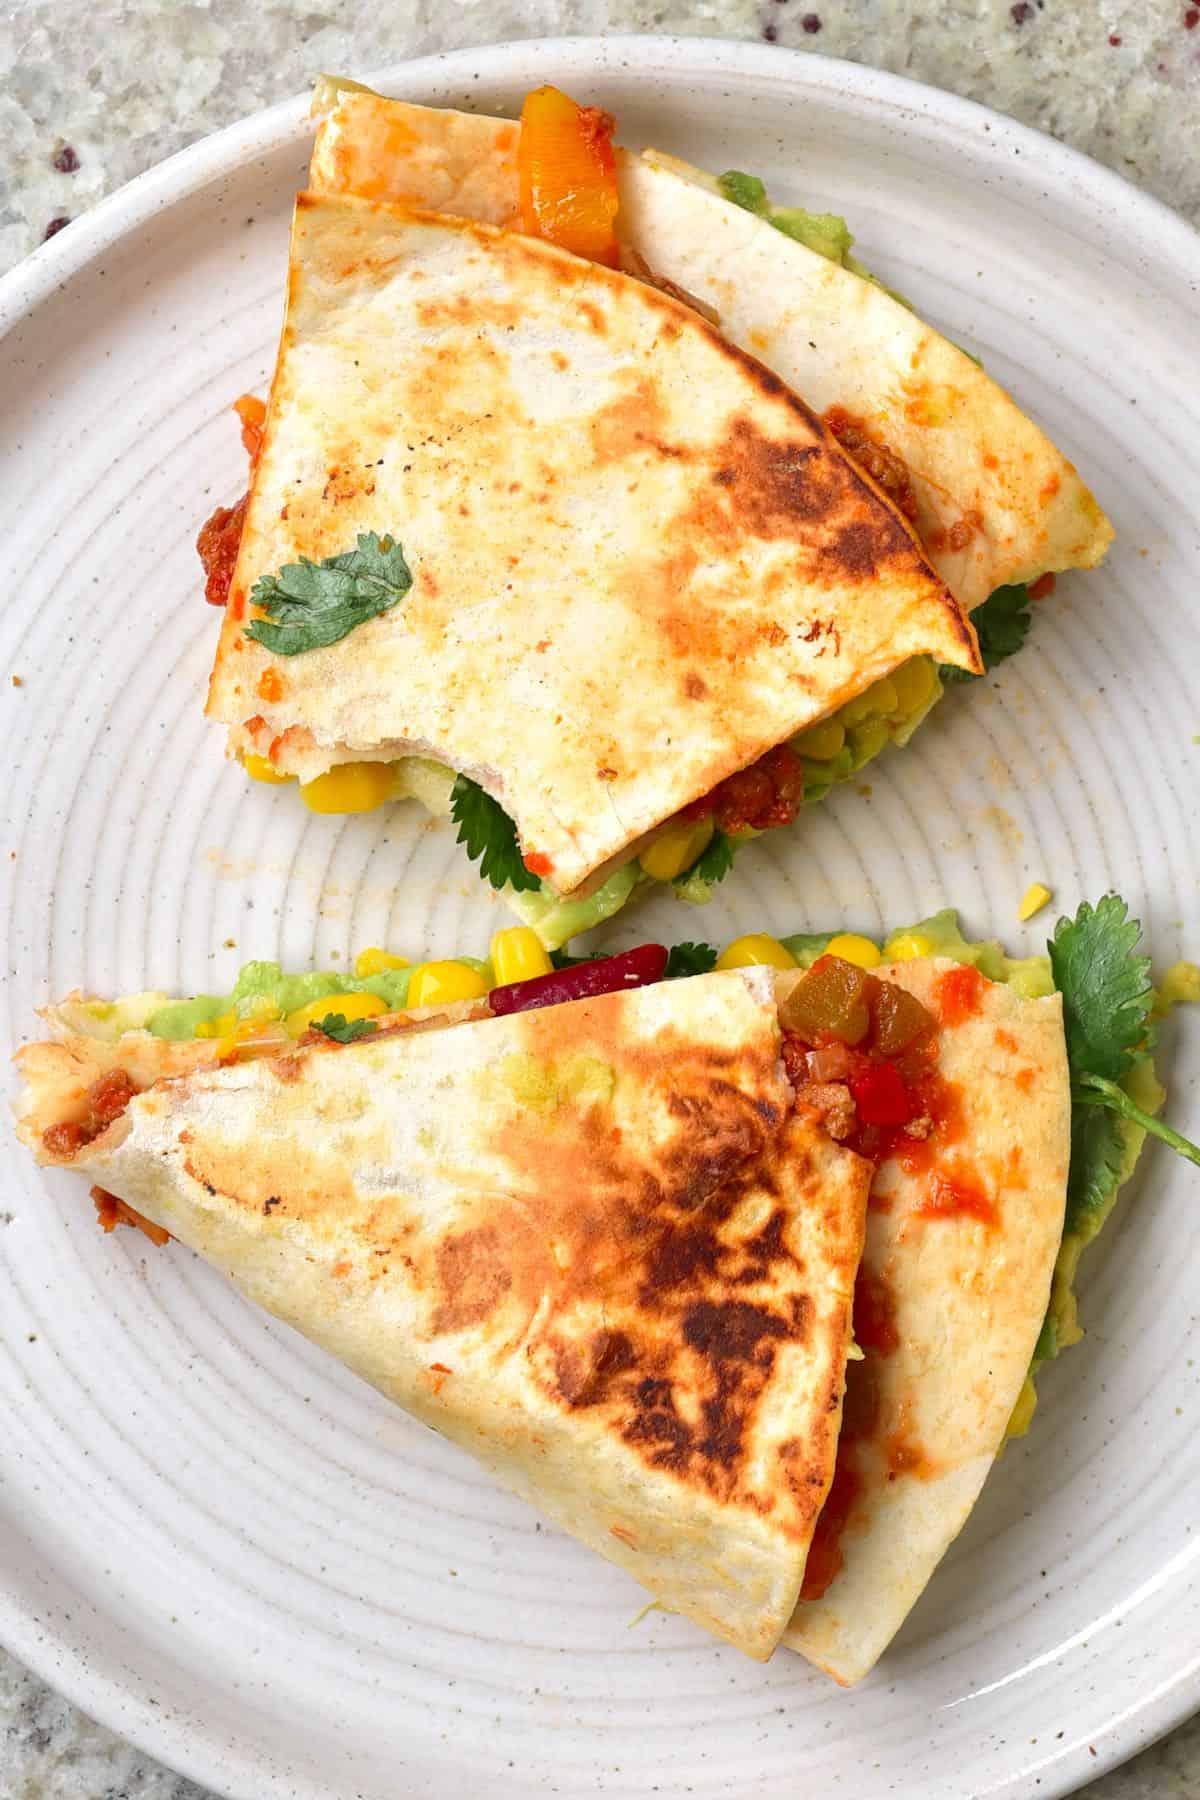 Tortilla wrap with vegan chili con carne, corn and avocado in a plate